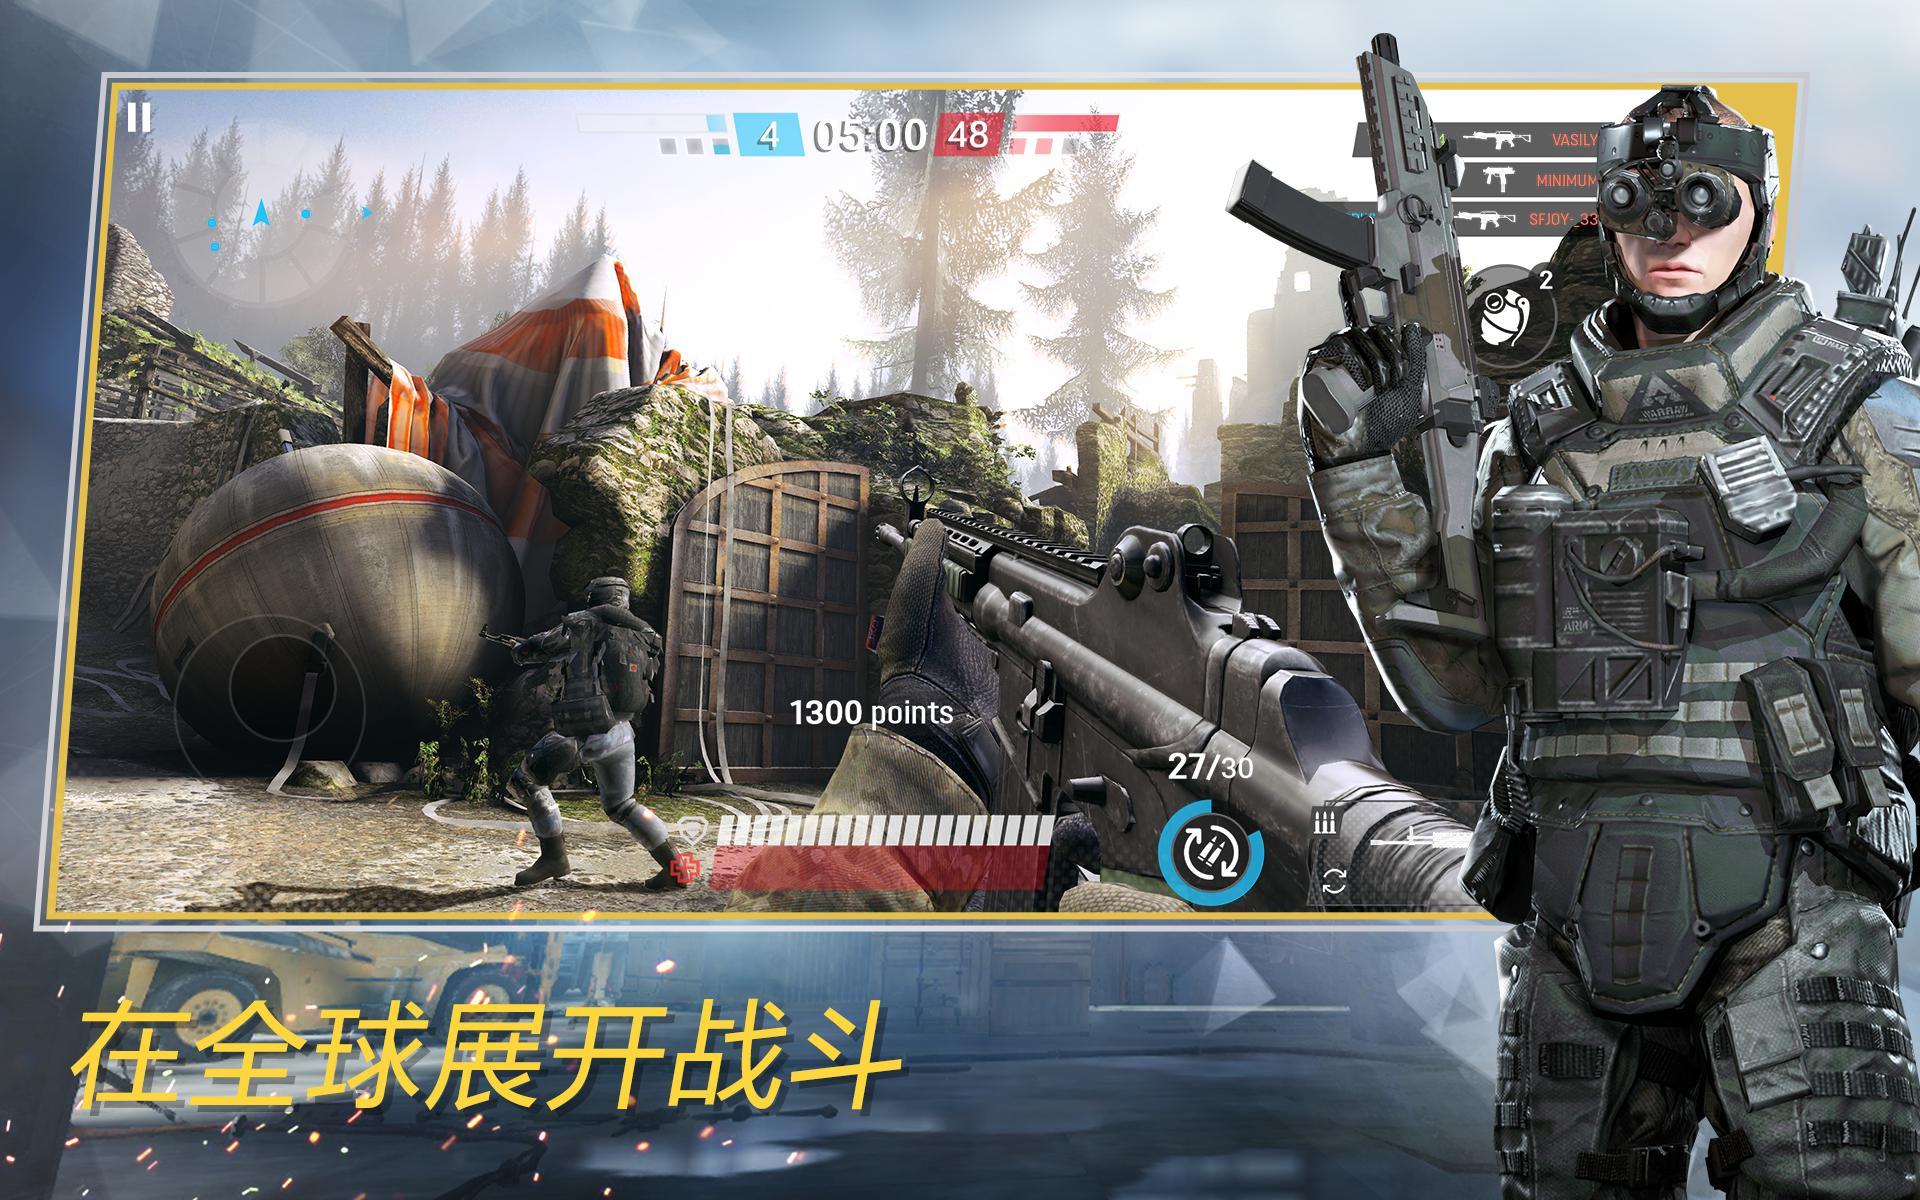 Warface: Global Operations: 第一人称动作射击游戏 游戏截图5